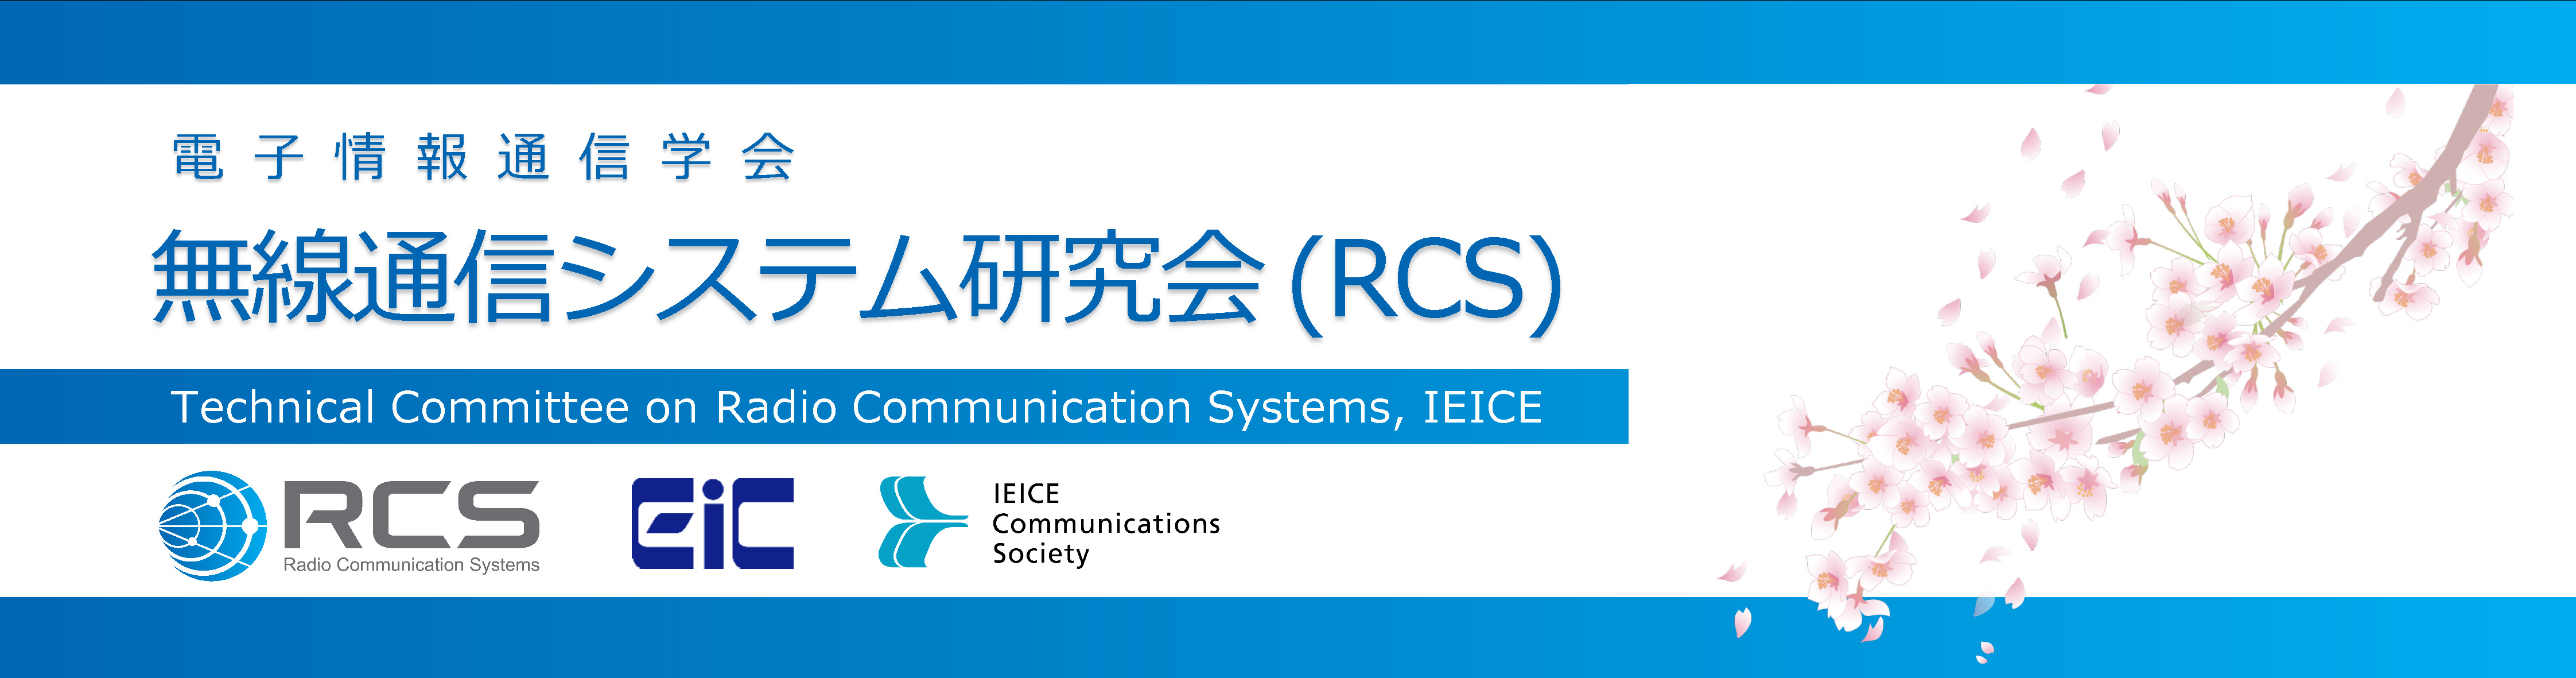 無線通信システム研究会